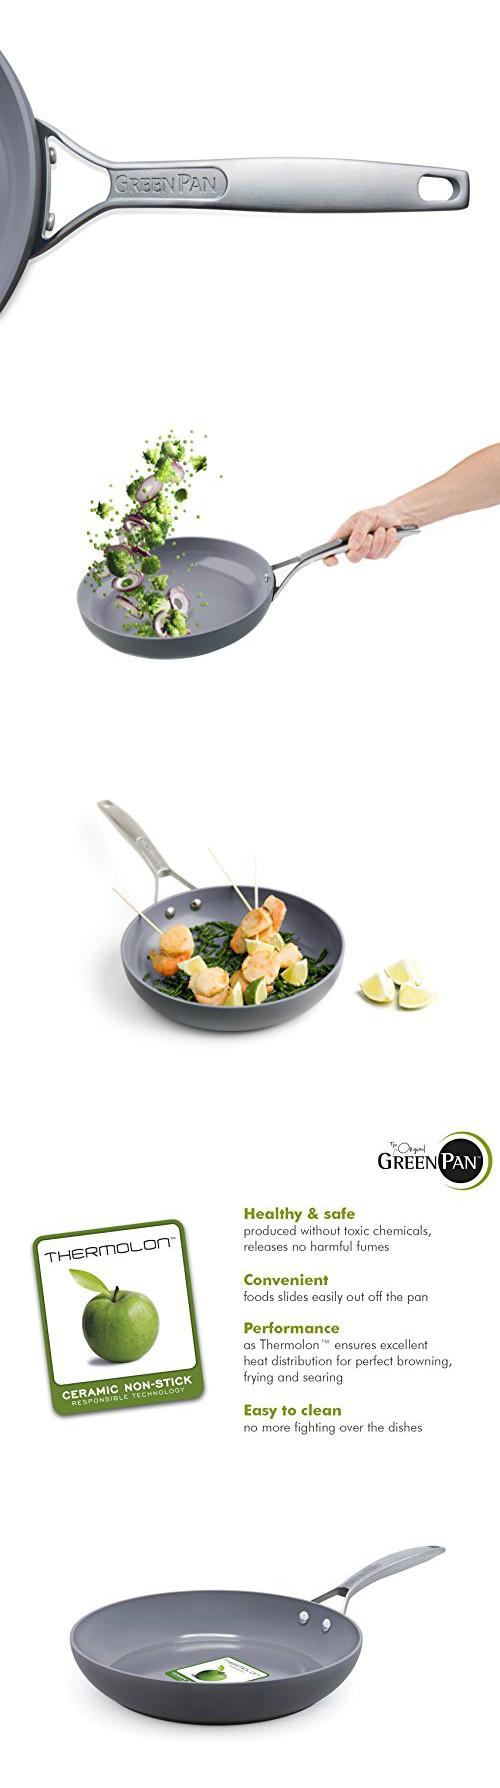 Greenpan Paris 10 Inch Ceramic Non Stick Fry Pan Woks Stir Kitchen